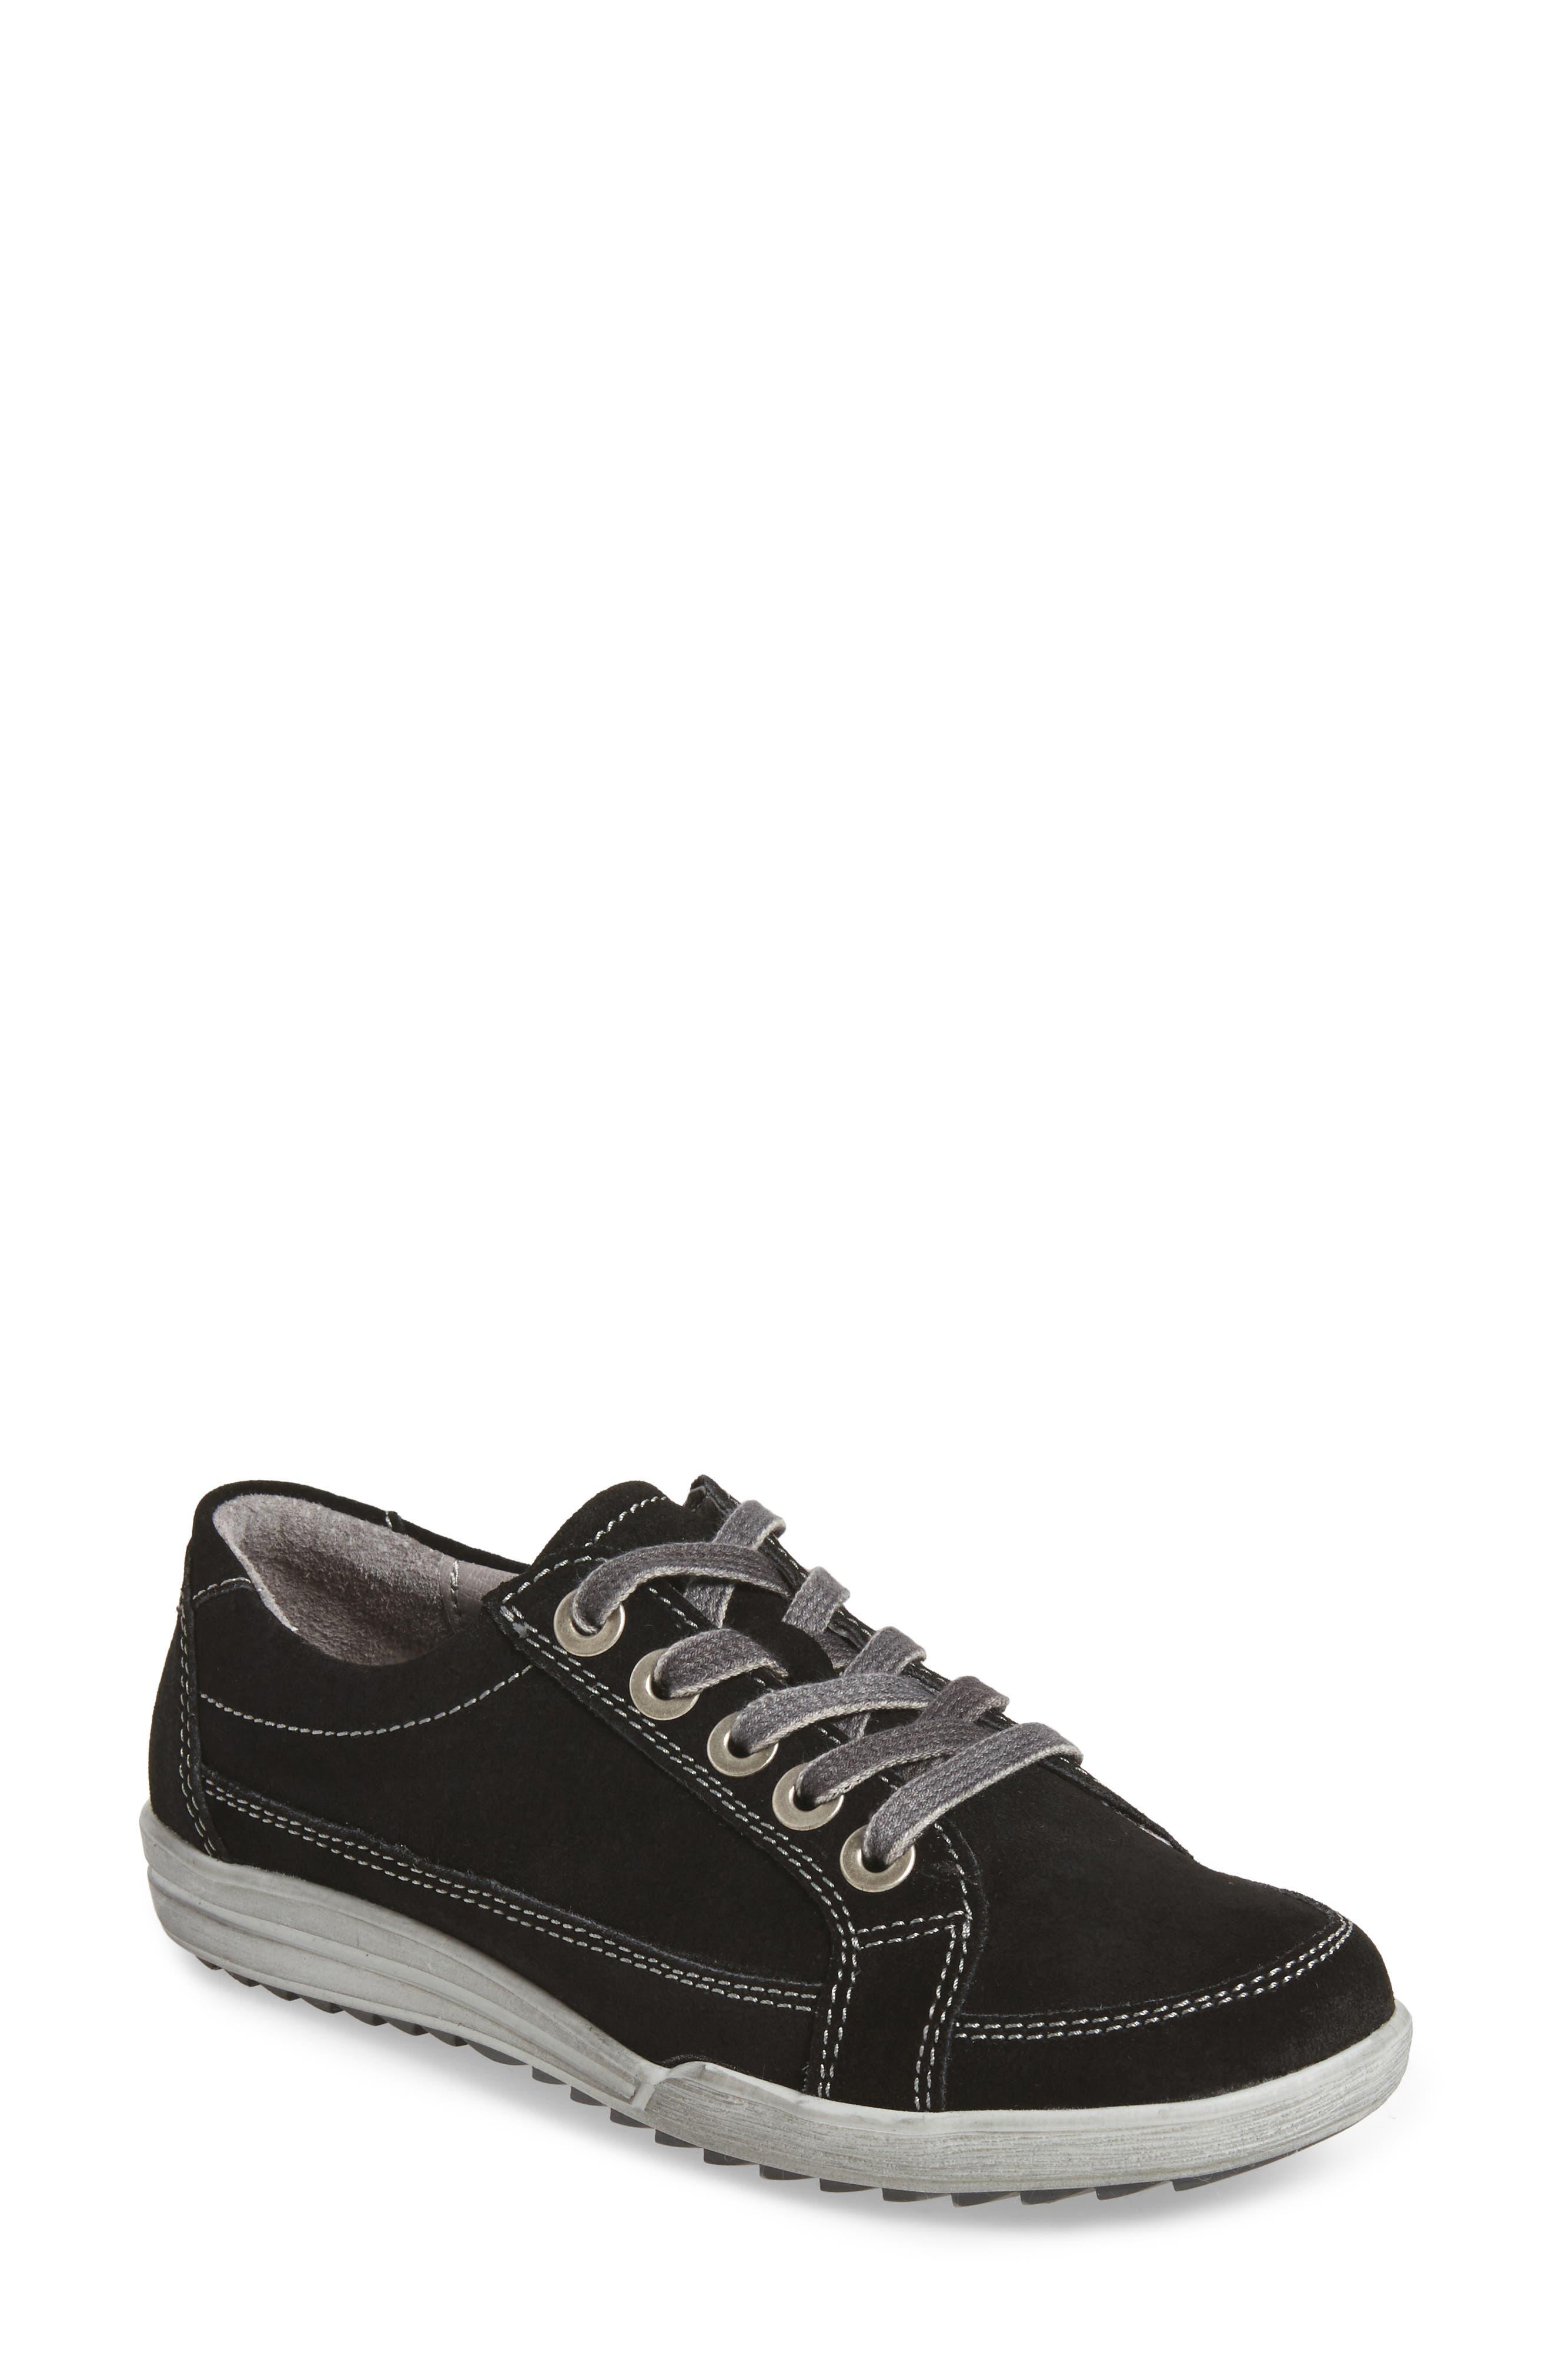 Alternate Image 1 Selected - Josef Seibel Dany 57 Sneaker (Women)